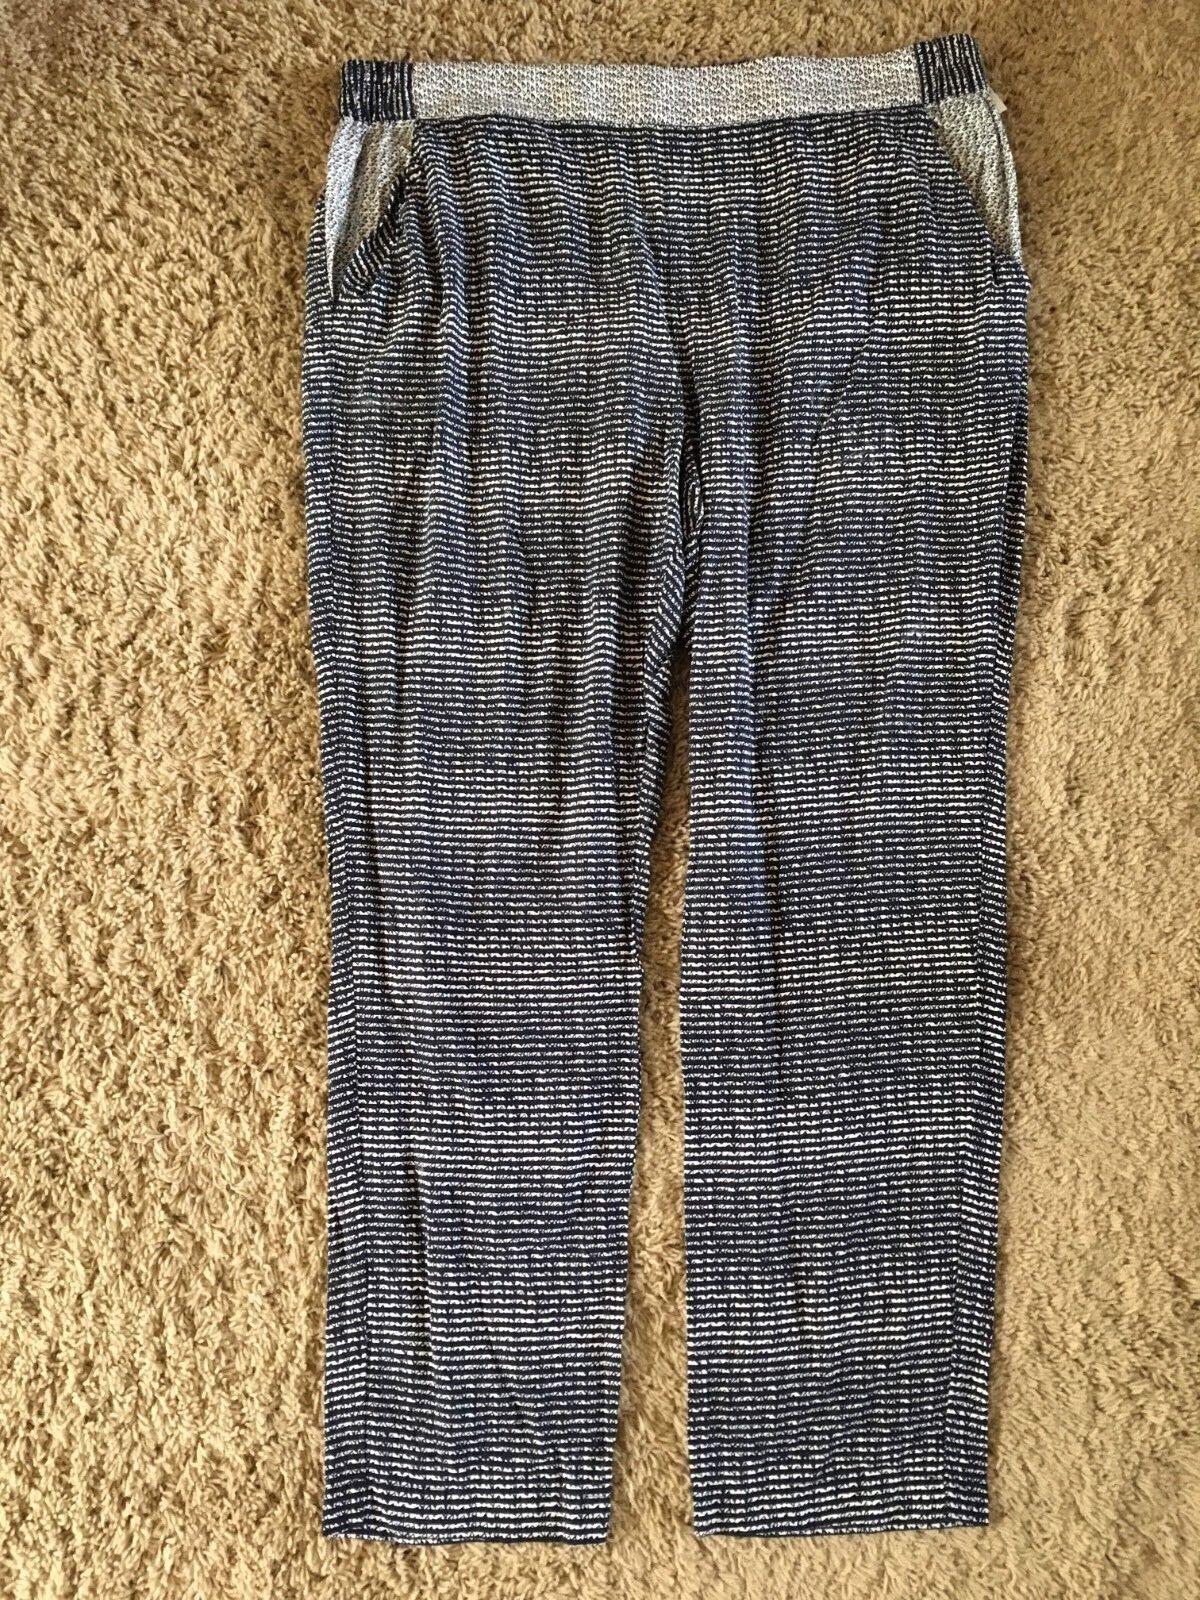 CABI  Strand PANTS size XL  Navy bluee White Spring 2016  Ret  99  EUC H88